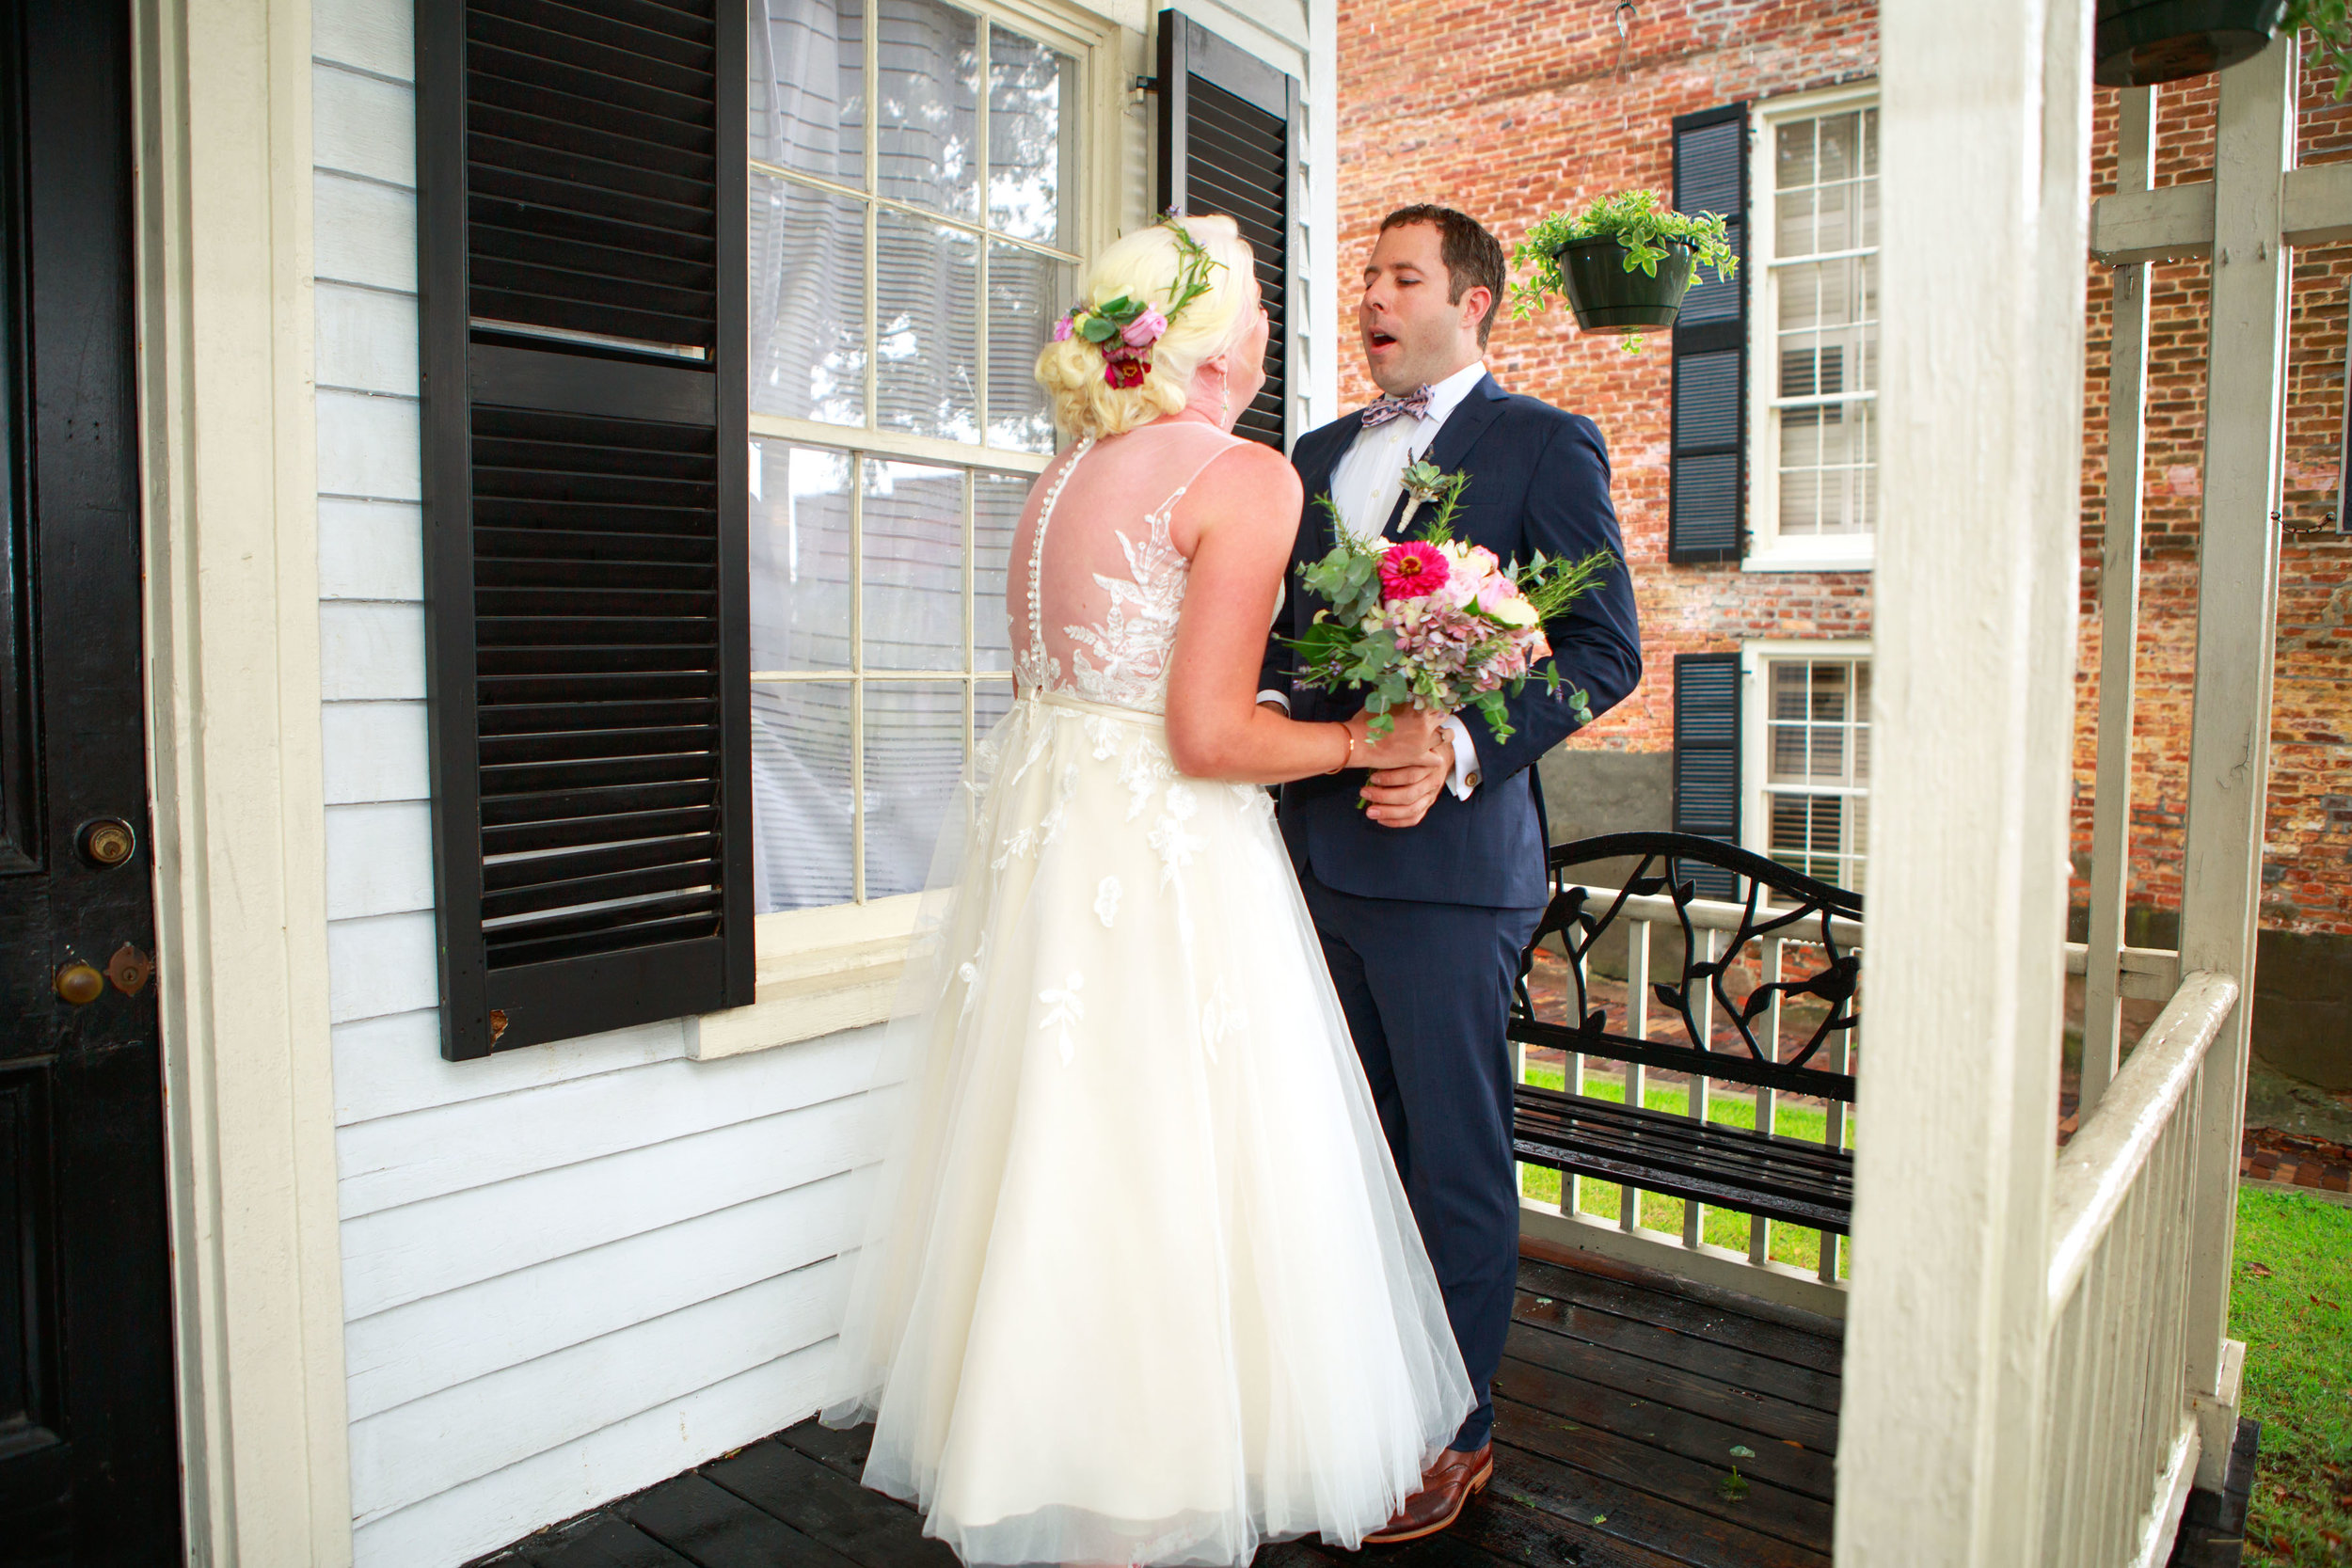 128-South-Wedding-Tiffany-Abruzzo-Photography-First-Look-7.jpg